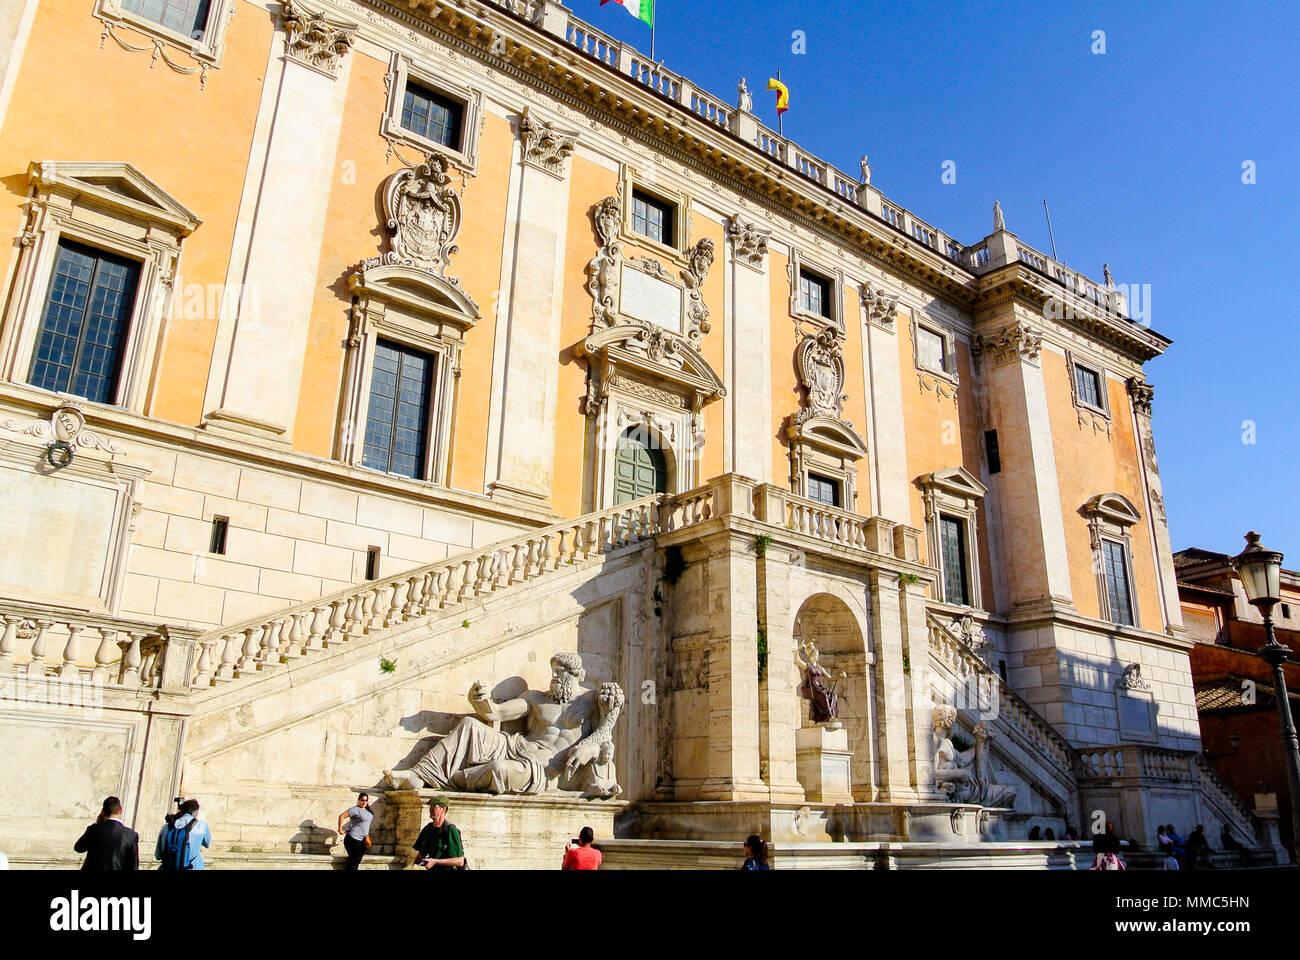 palazzo senatorio, rome, italy - Stock Image